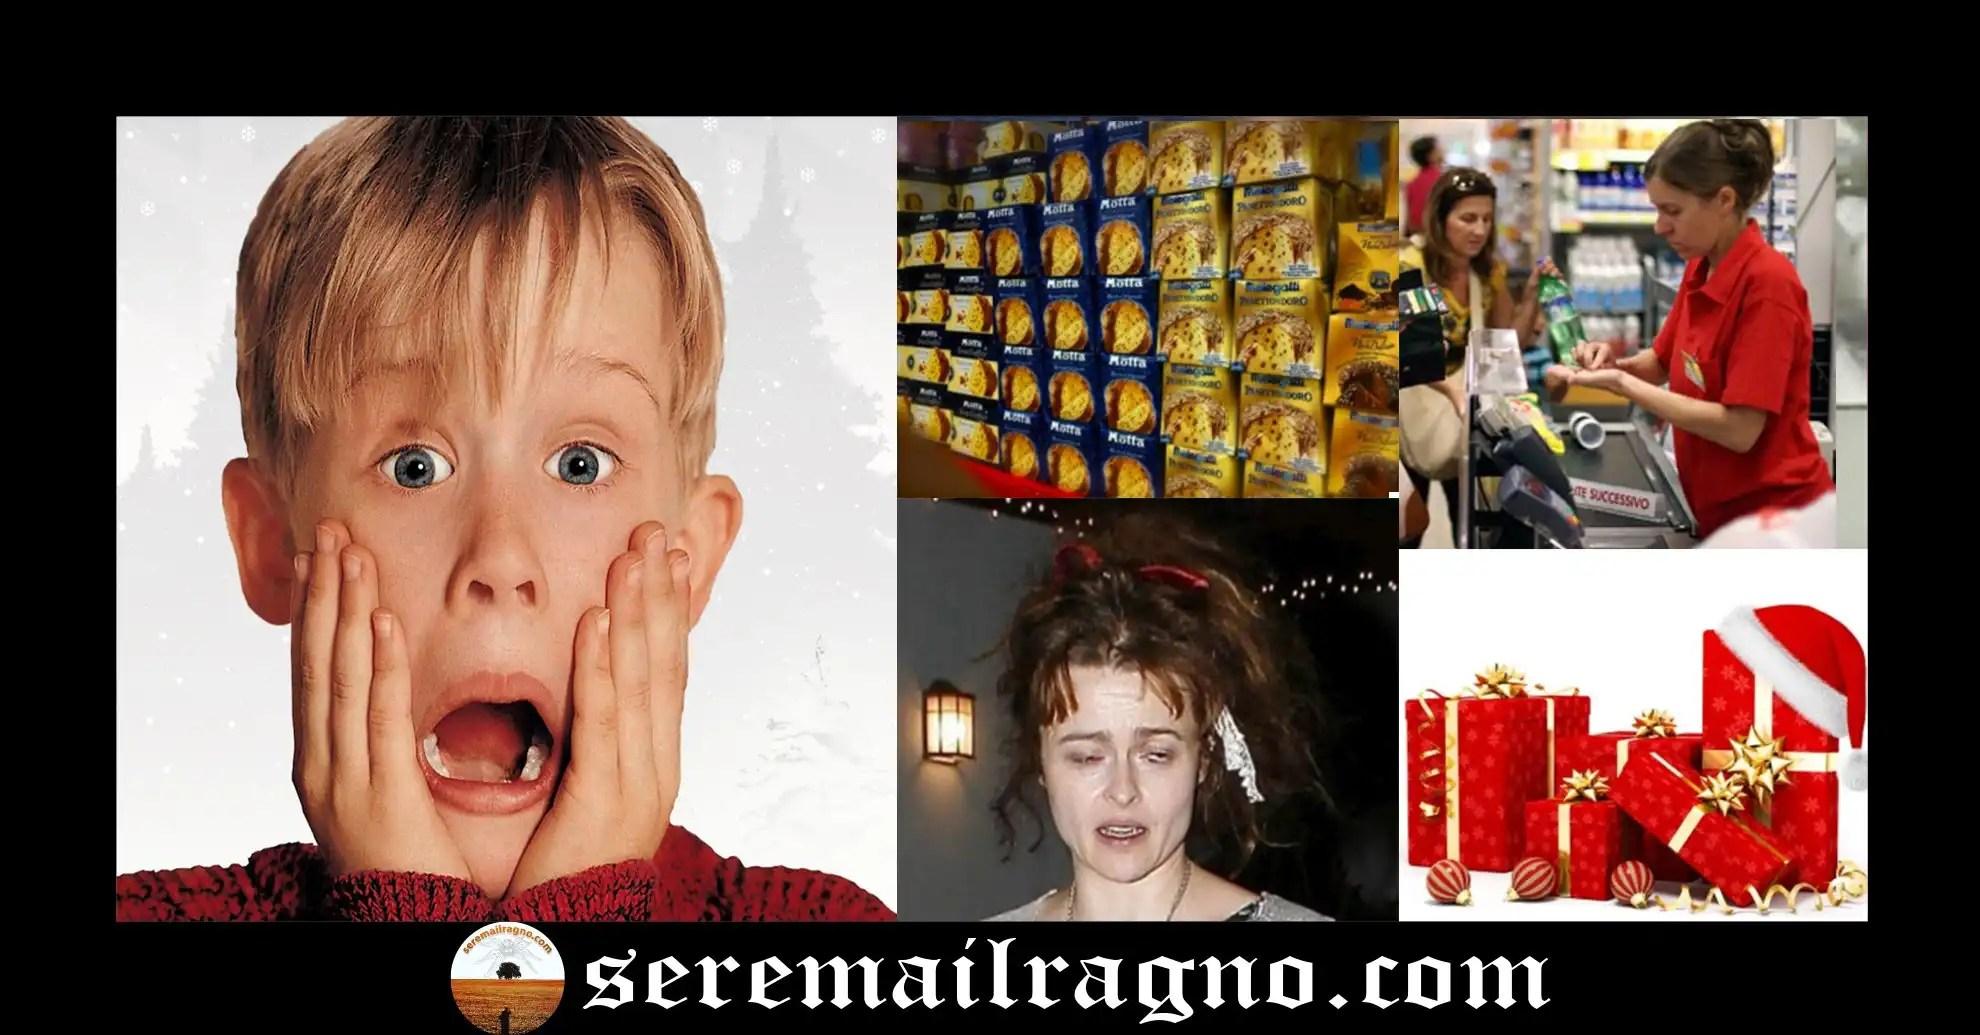 7 segnali di ansia prefestiva da shopping